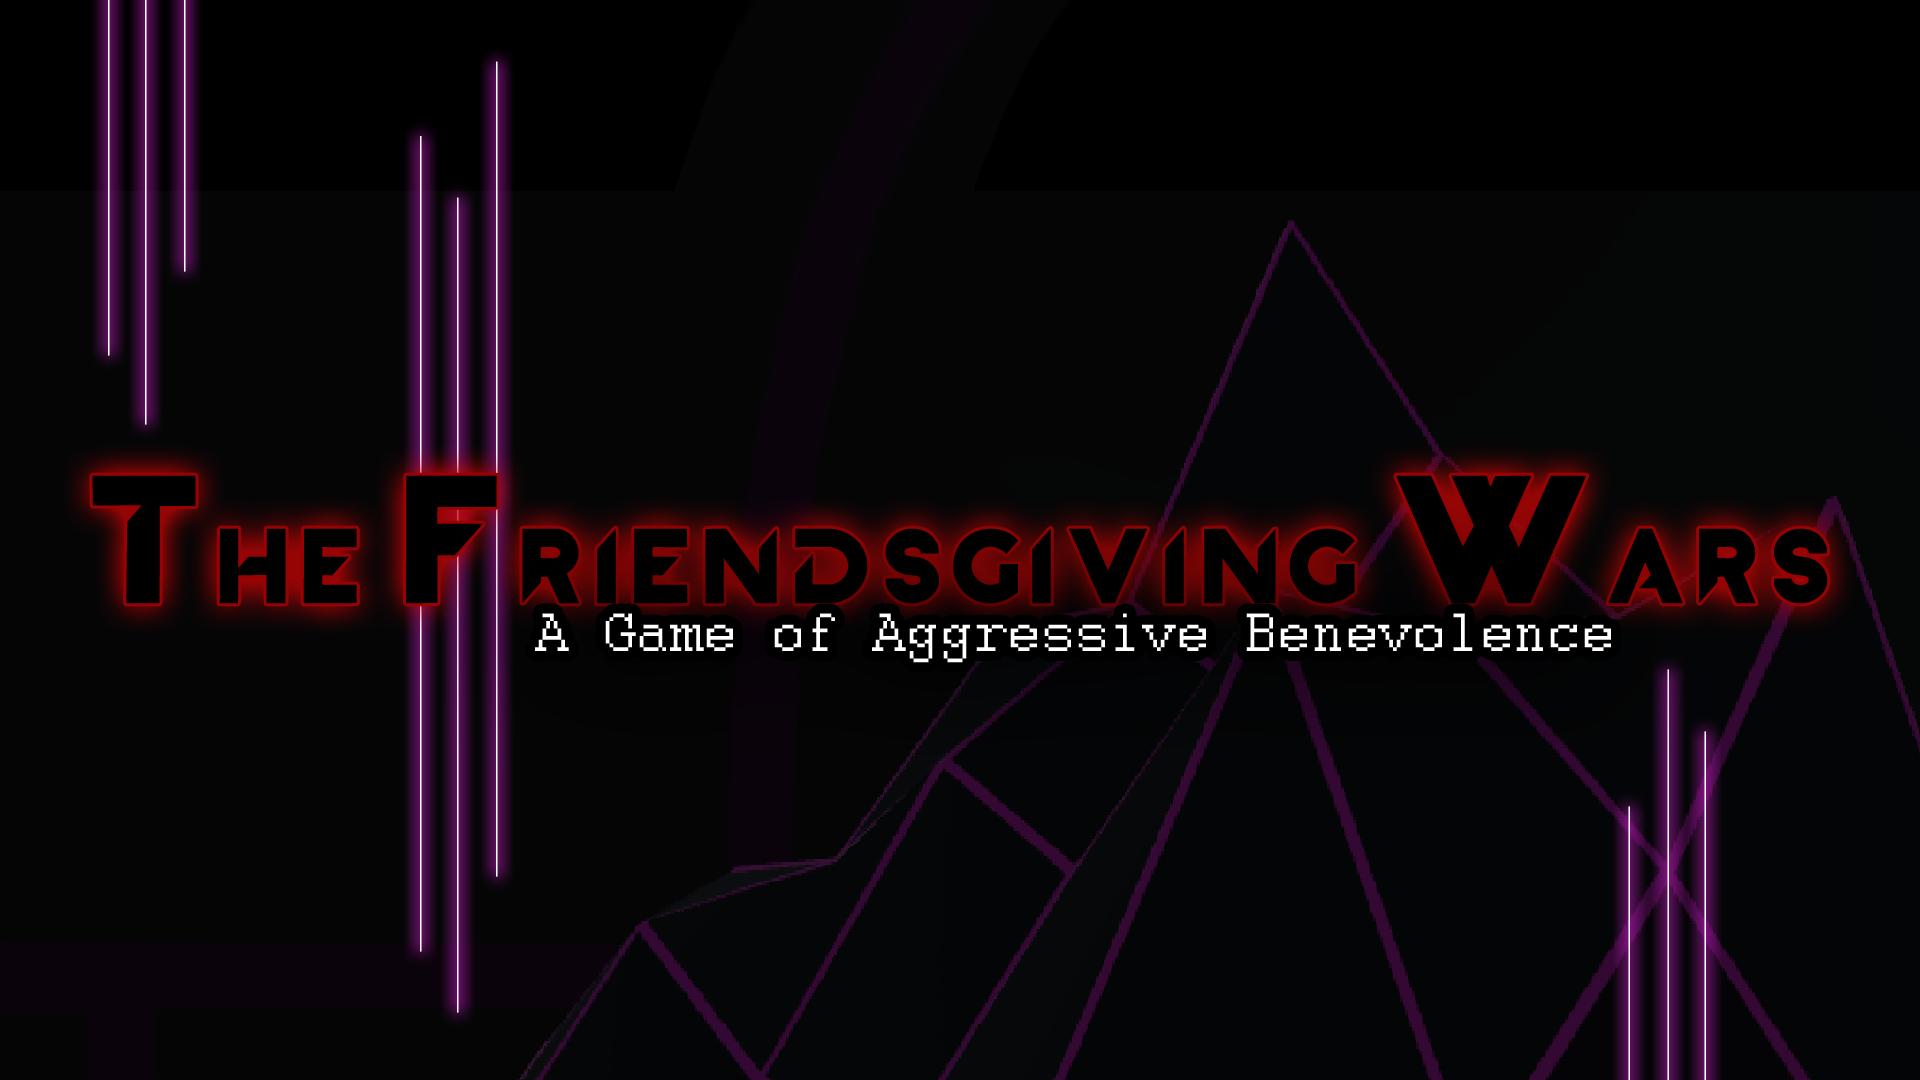 The Friendsgiving Wars